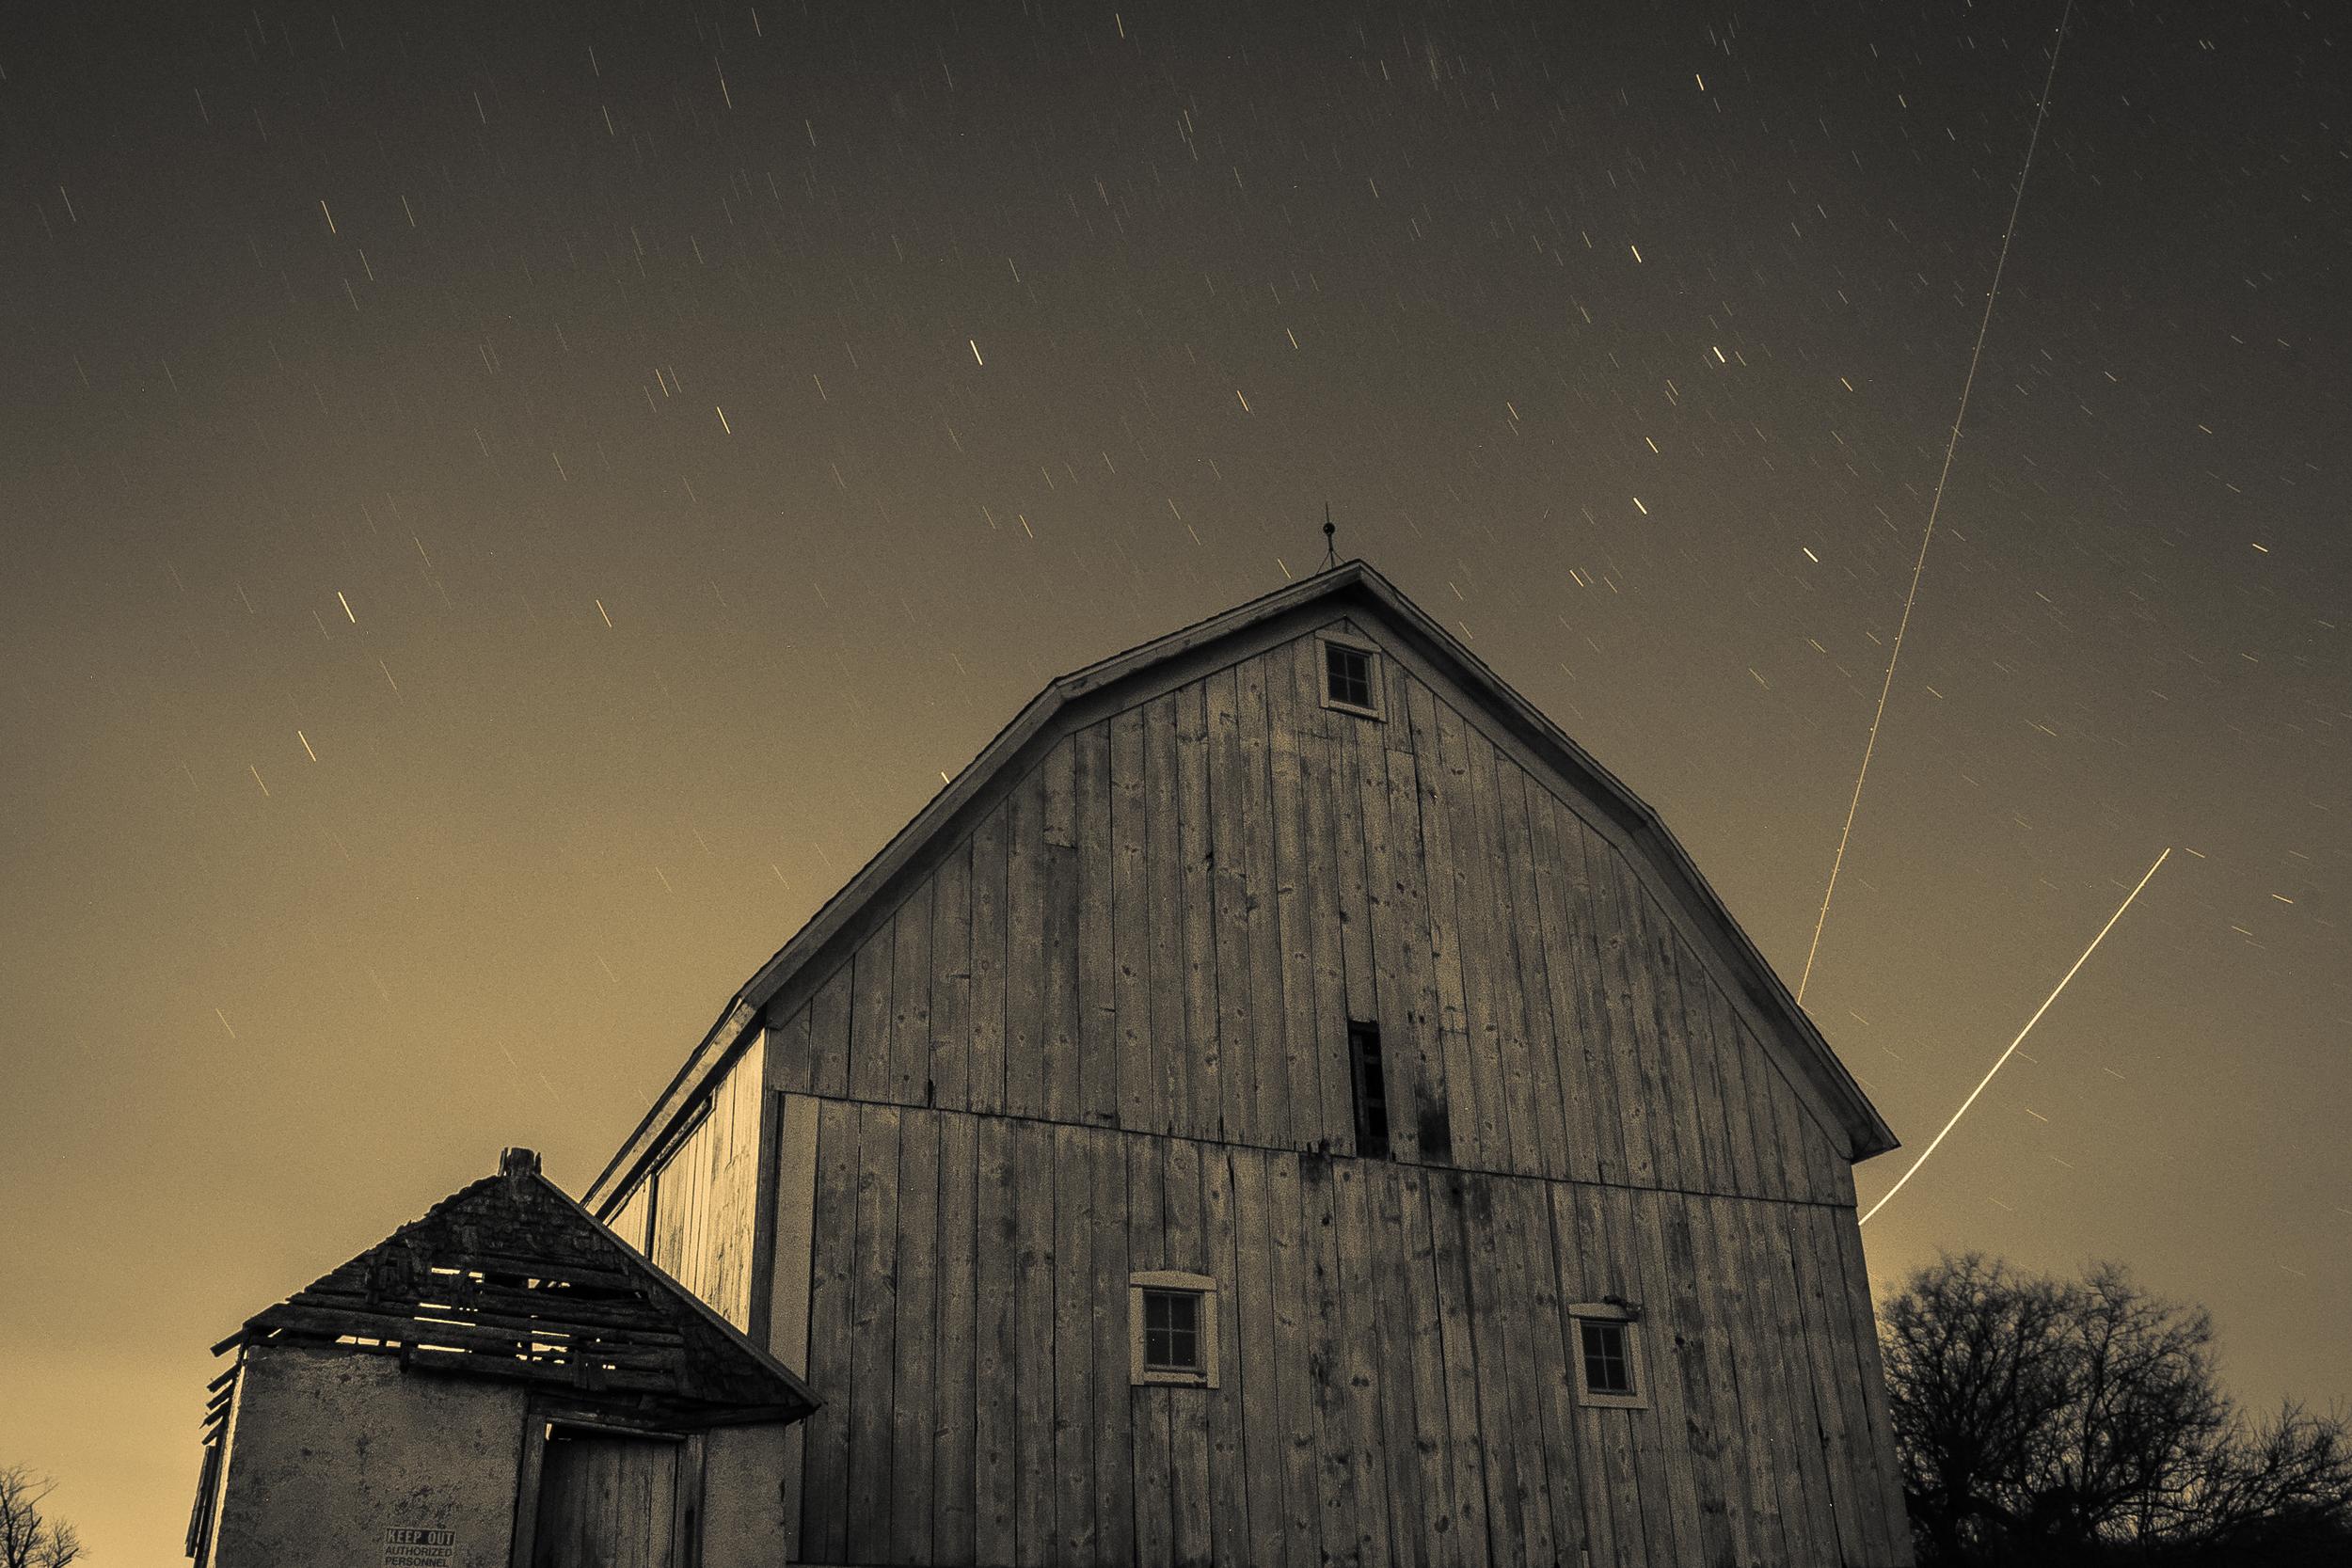 Stars_farm_night_cary_illinois_winter